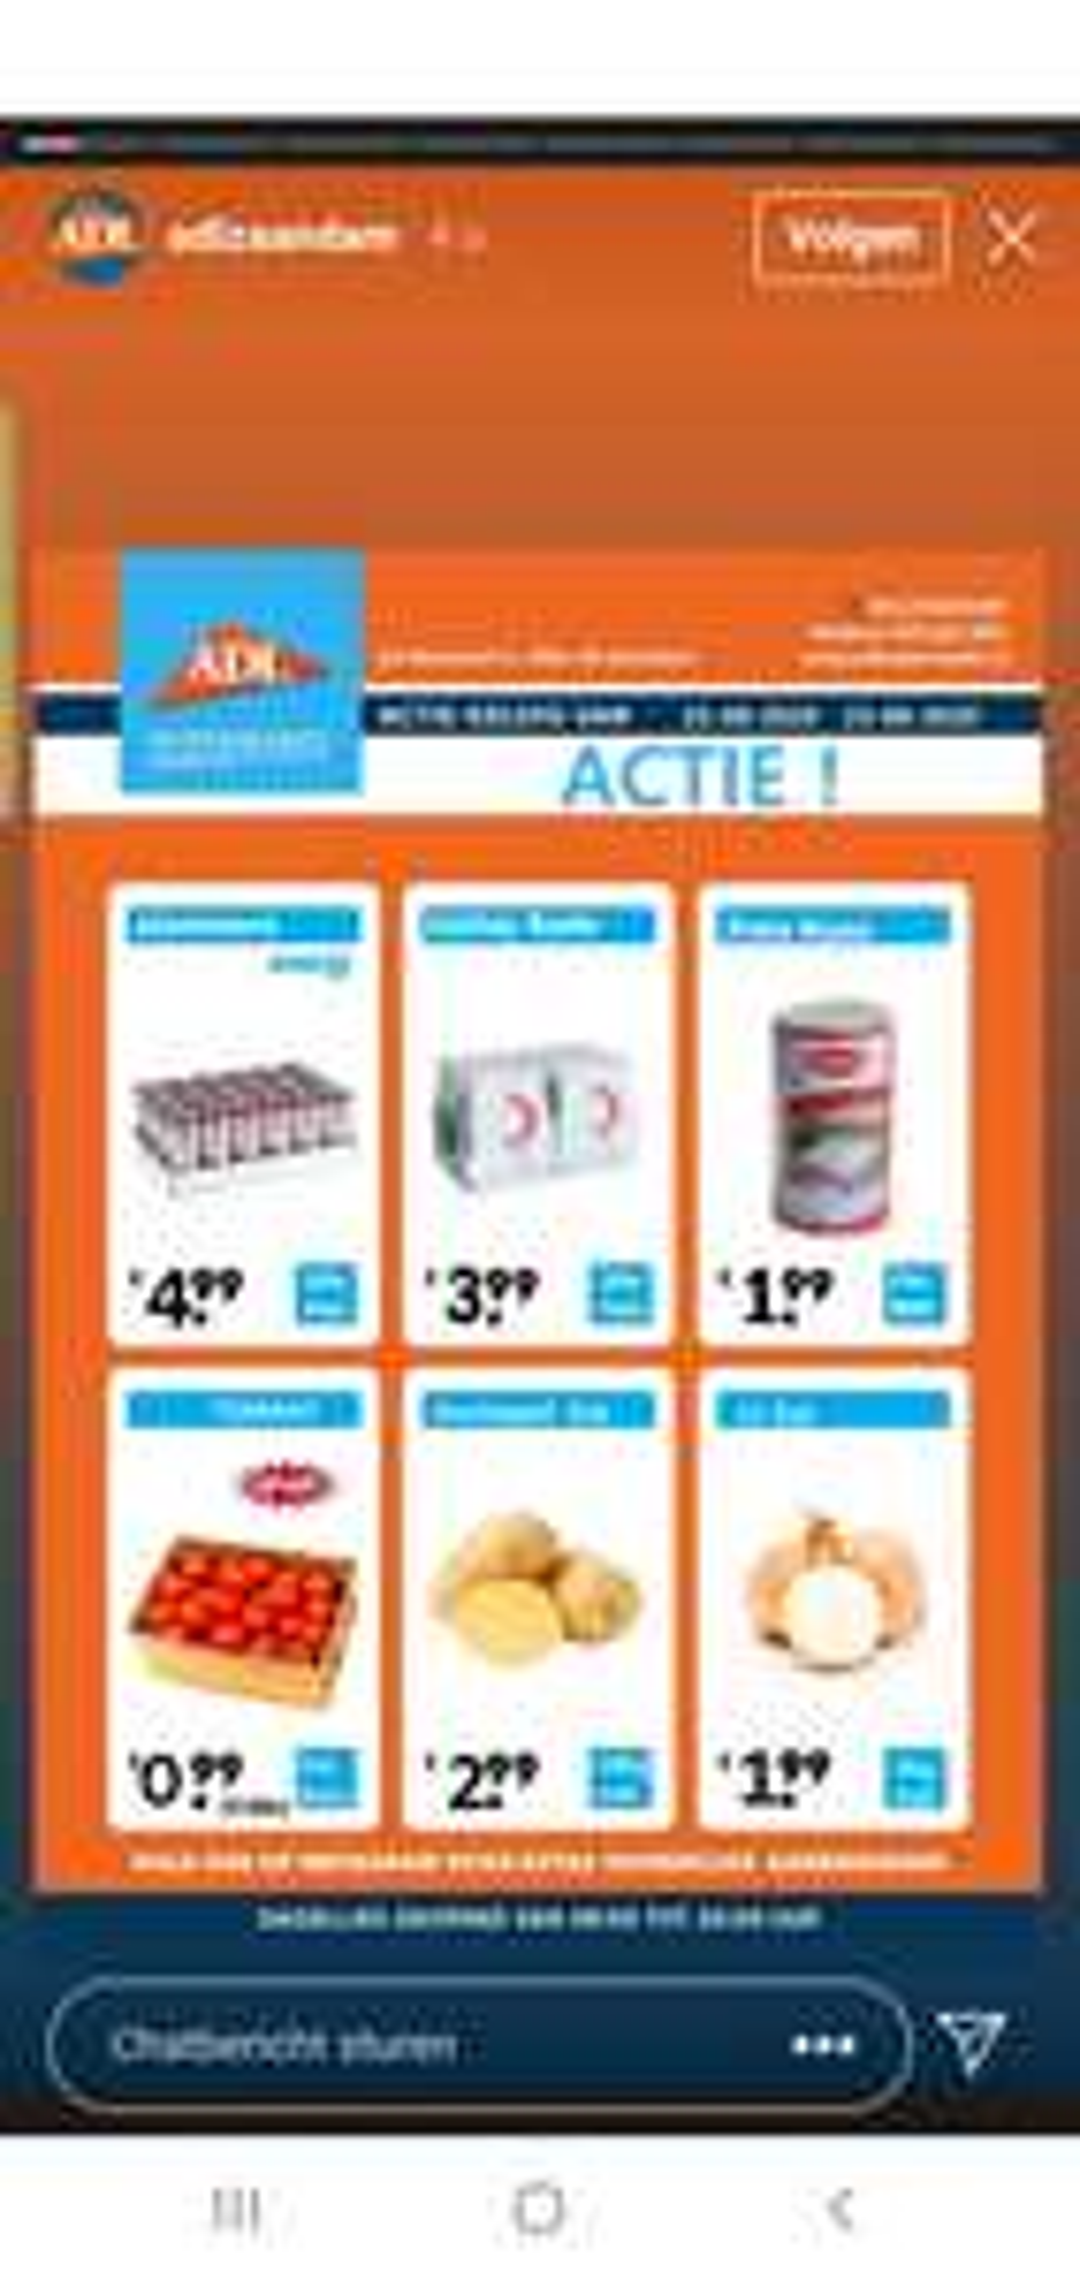 [LOKAAL] o.a 5 kilo tomaten voor 1 euro @ ADL Supermarkt Zaandam